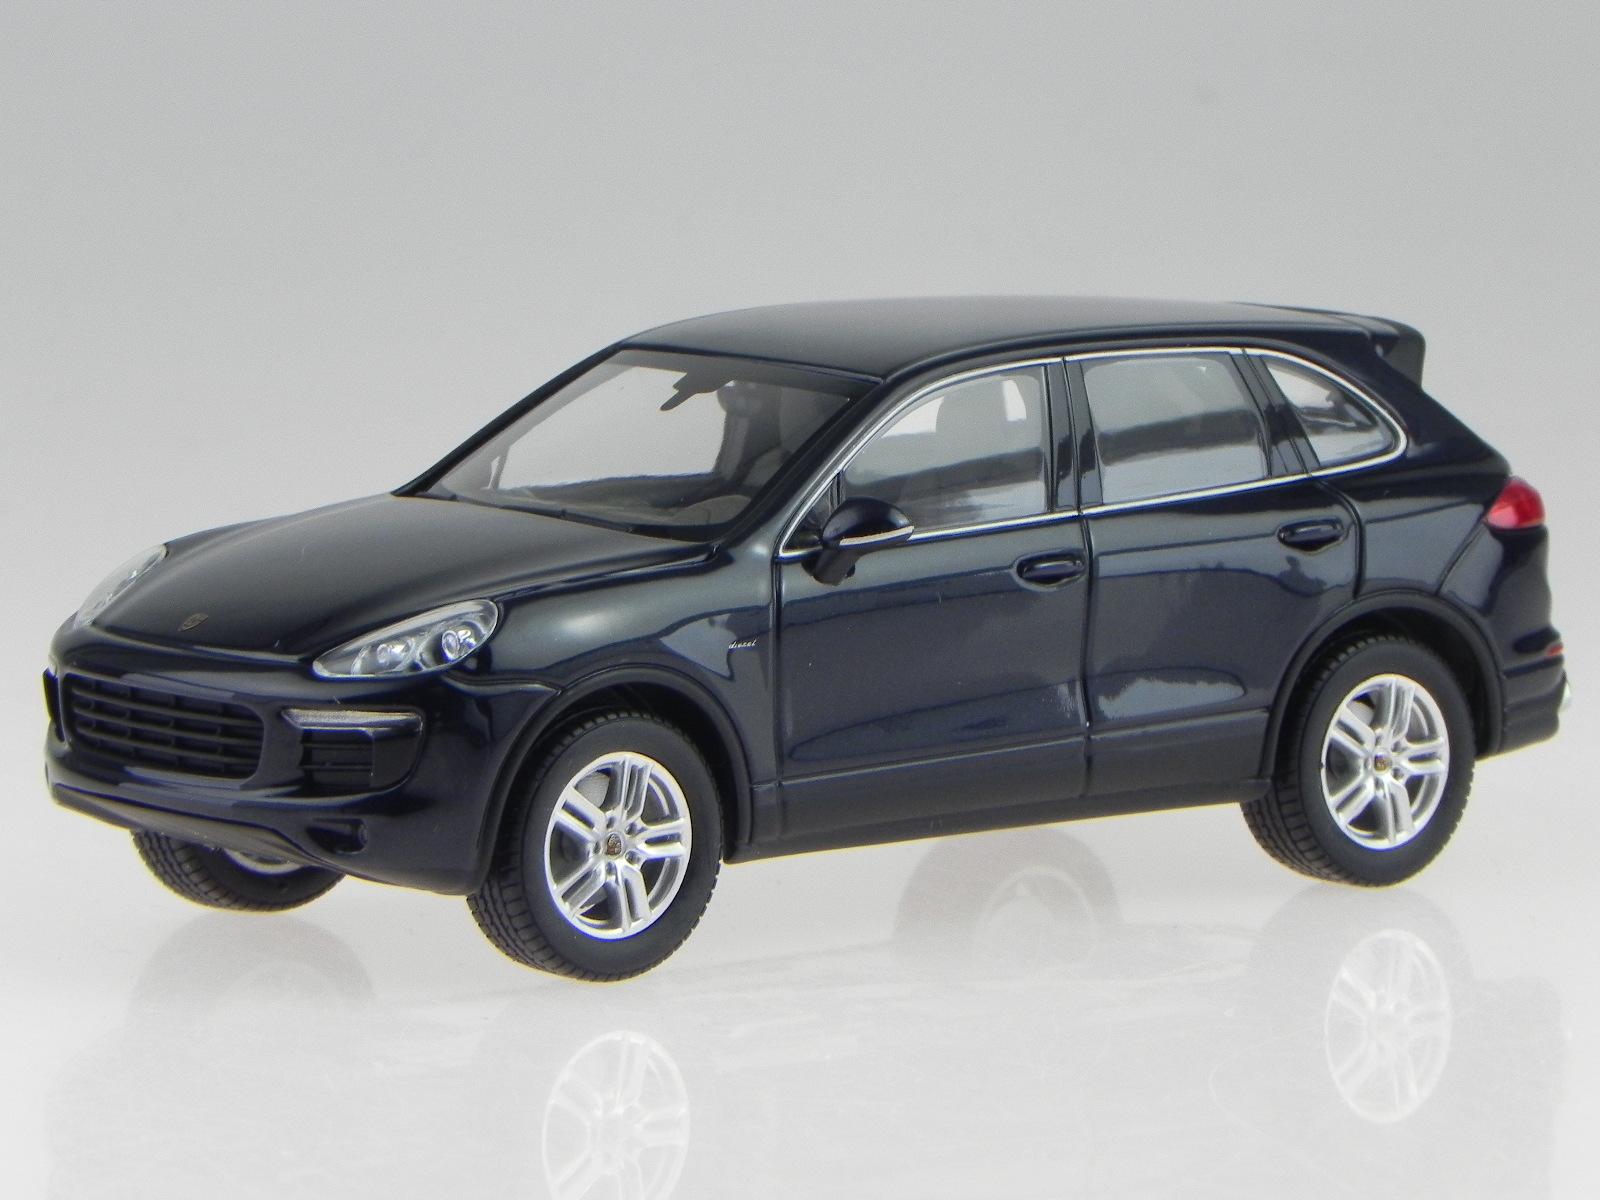 Porsche Cayenne S Diesel E2 Ii Blue Diecast Model Car 200080e Minichamps 1 43 For Sale Online Ebay